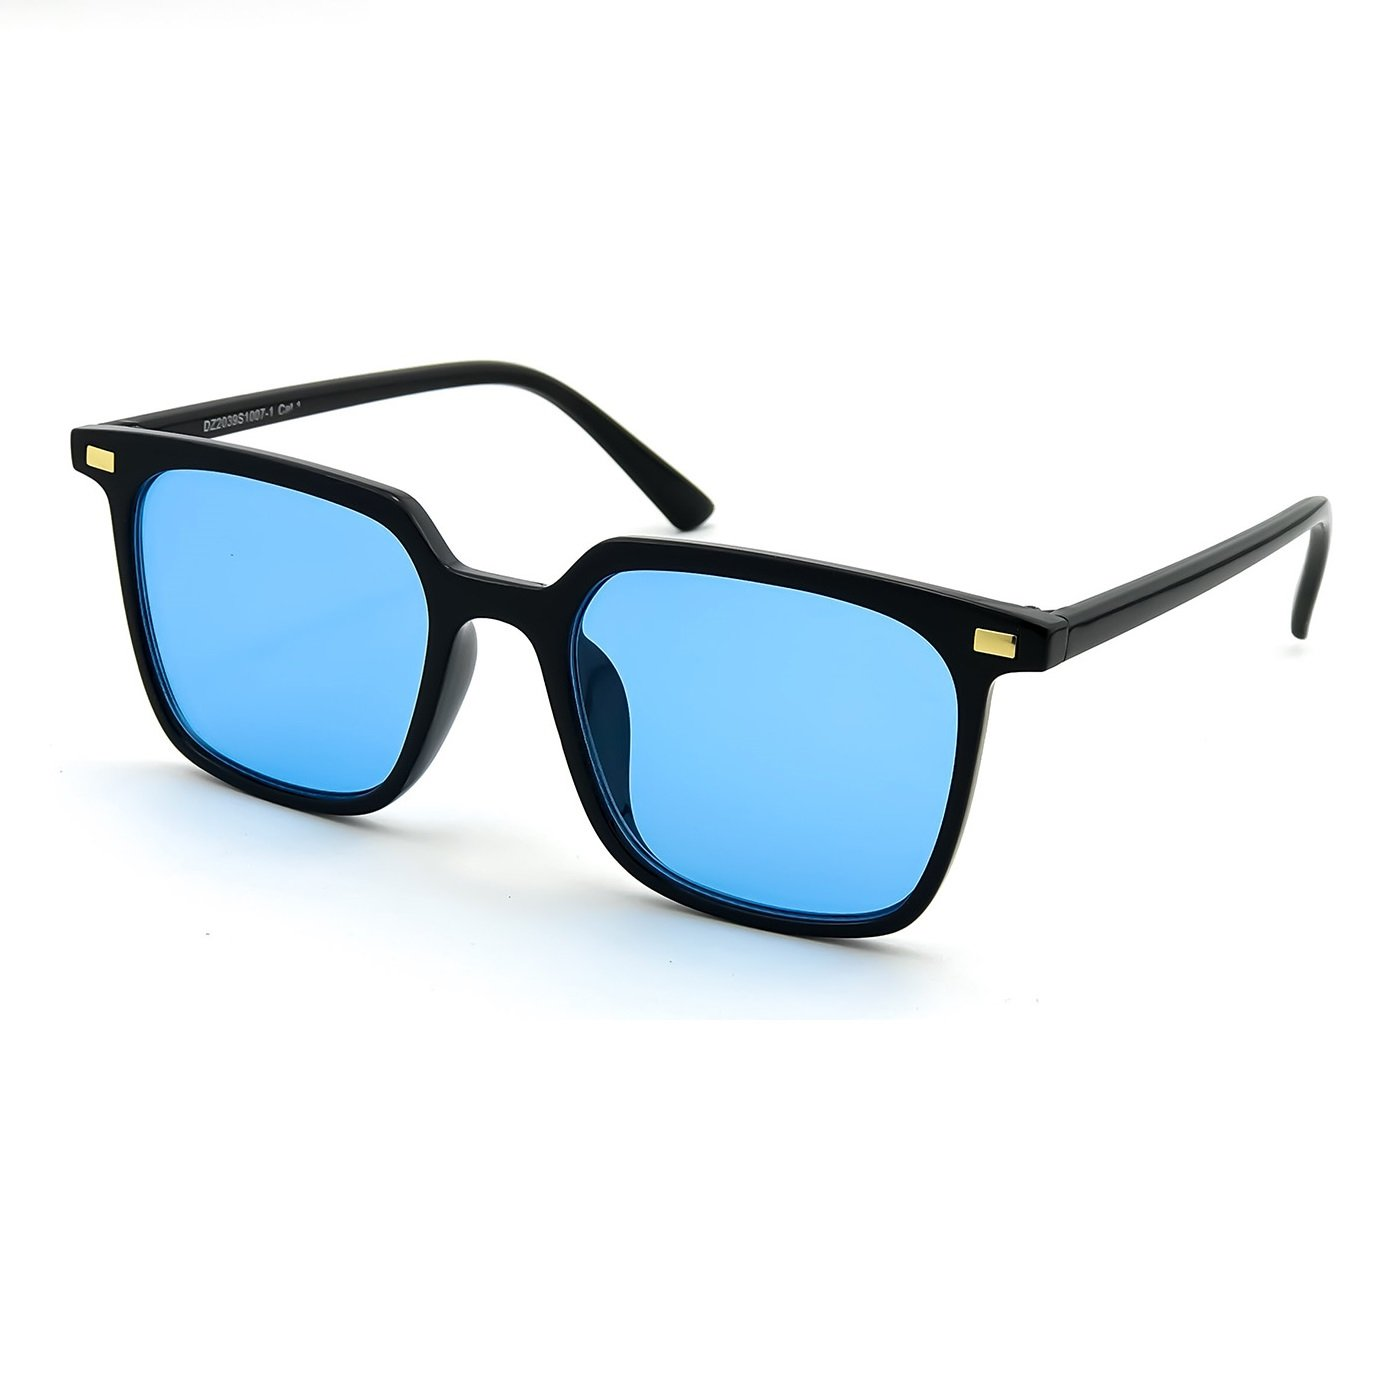 bfc1a29441 Sunglasses KISS - Fashion Concept mod. HALL - man woman HIPSTER square  vintage unisex - BLACK Blue  Amazon.co.uk  Clothing